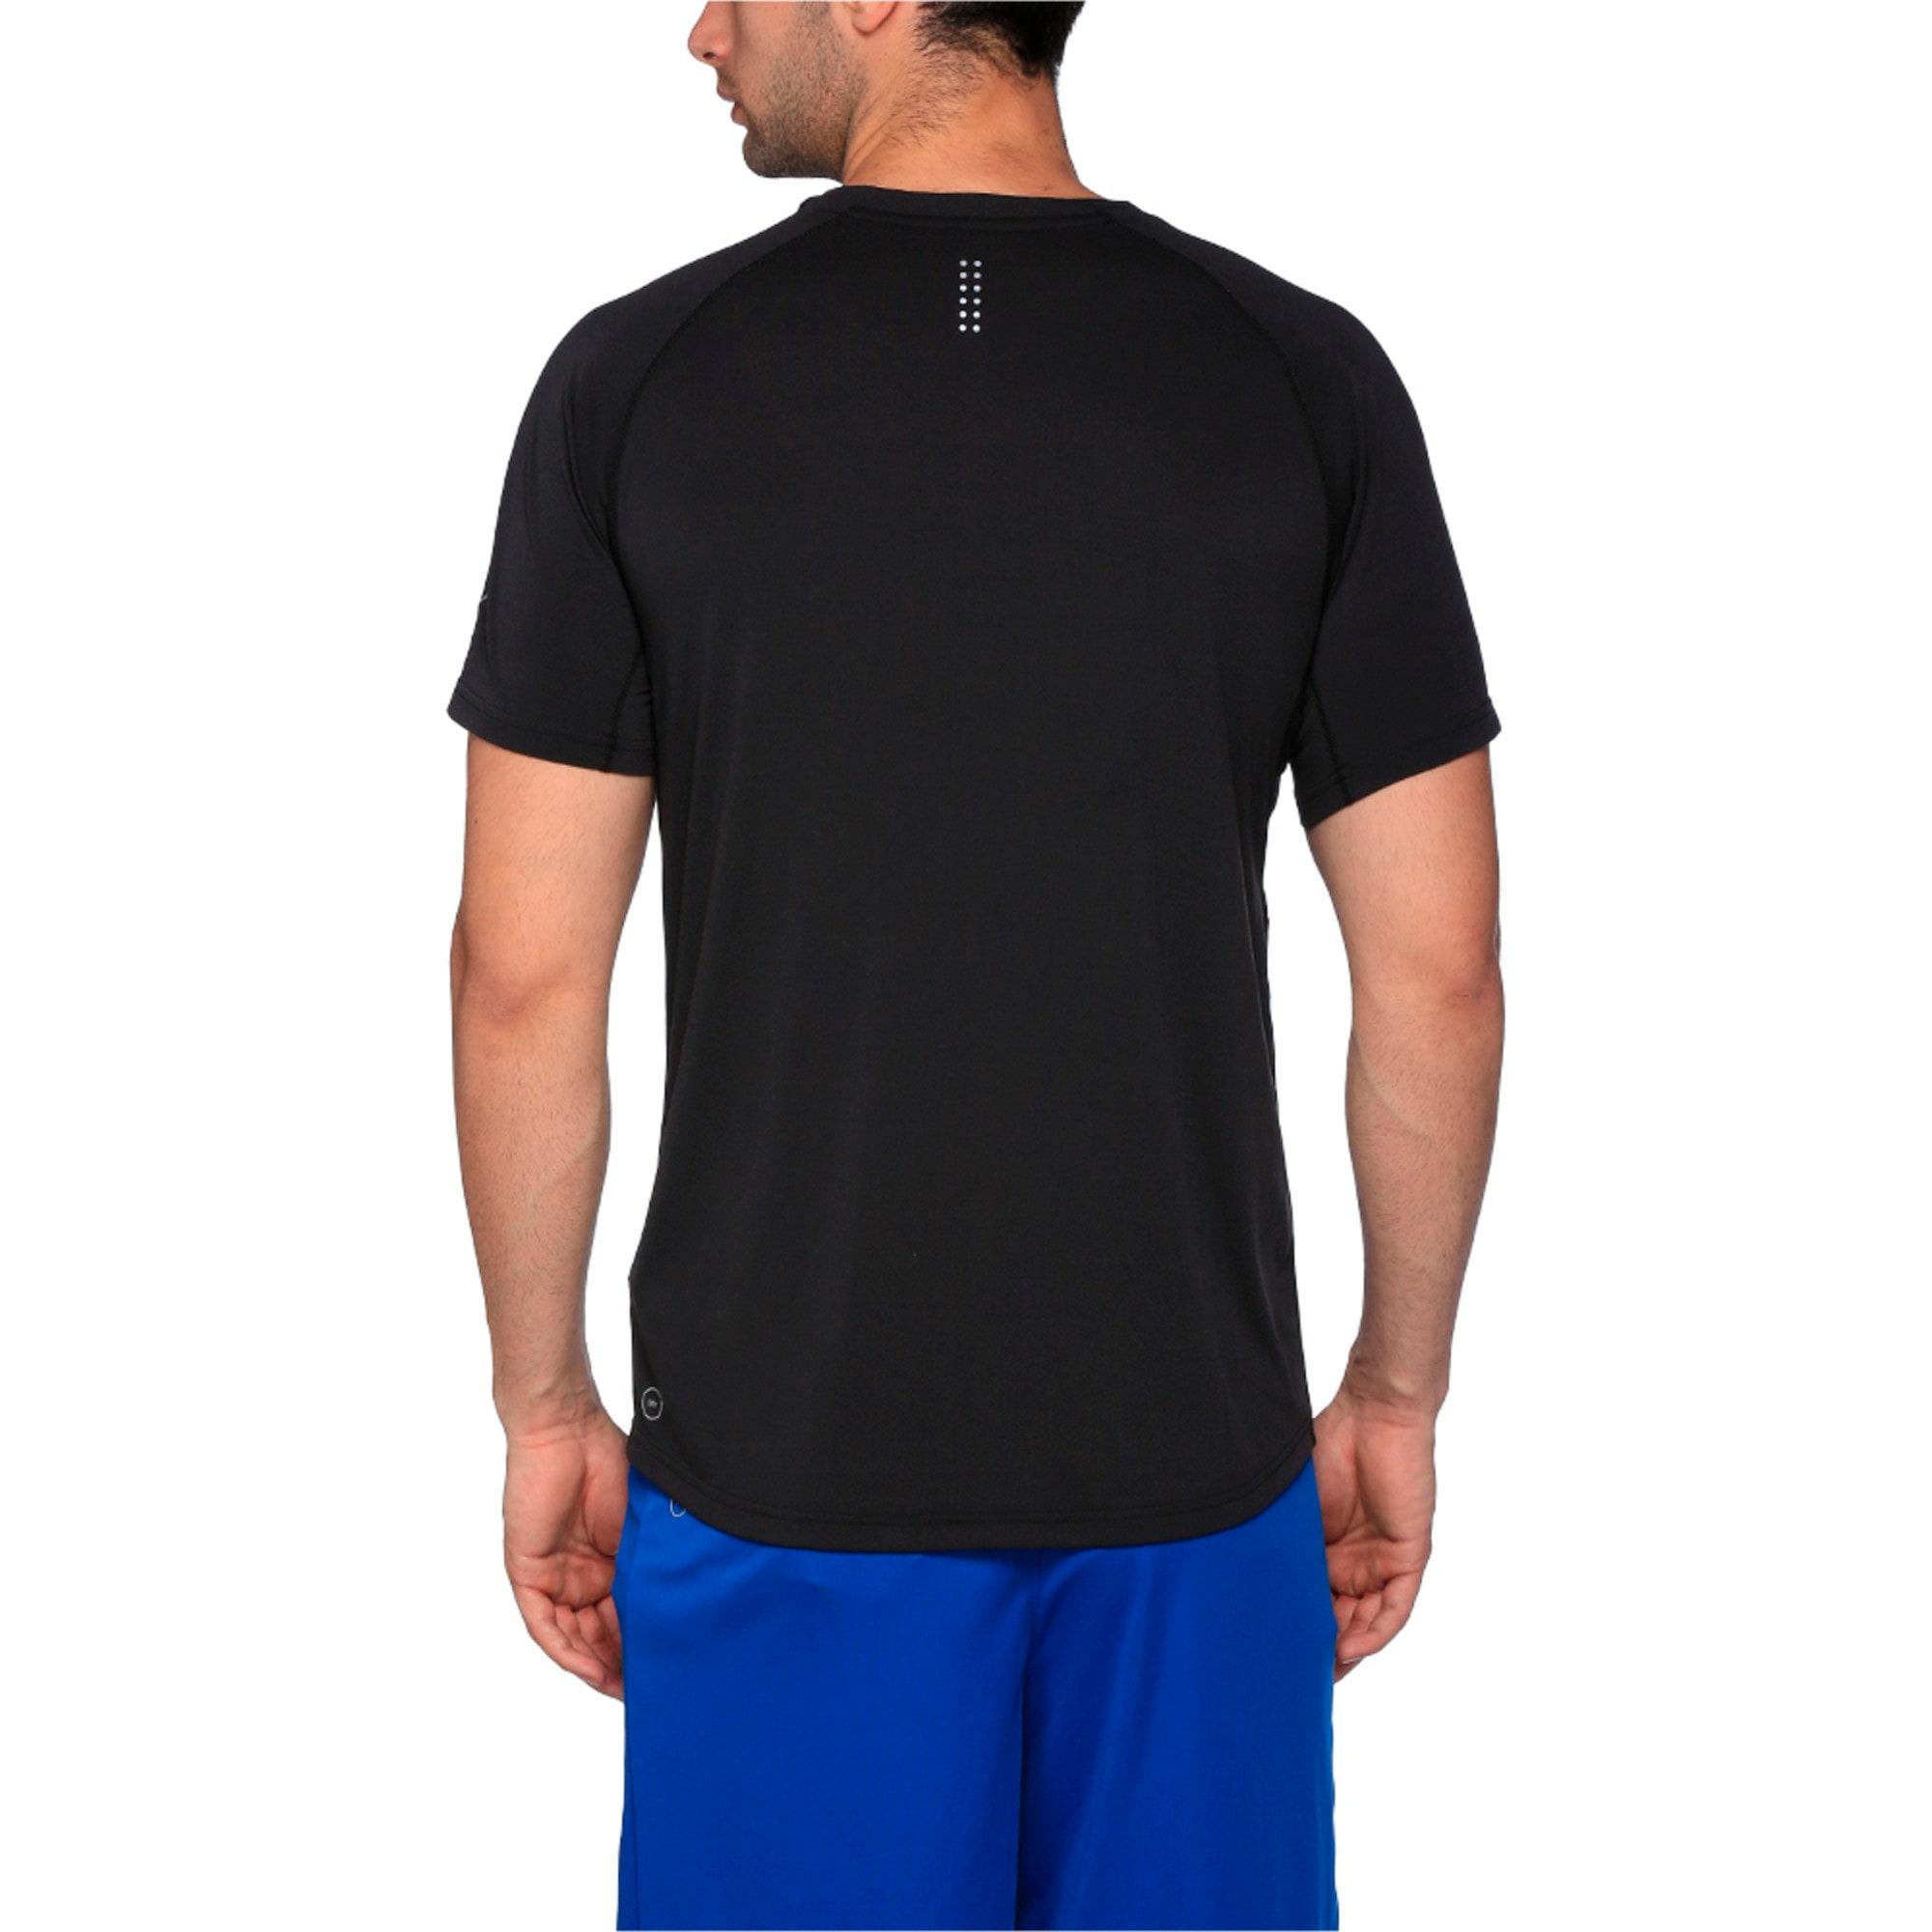 Thumbnail 3 of Running Men's Run T-Shirt, Puma Black Heather, medium-IND